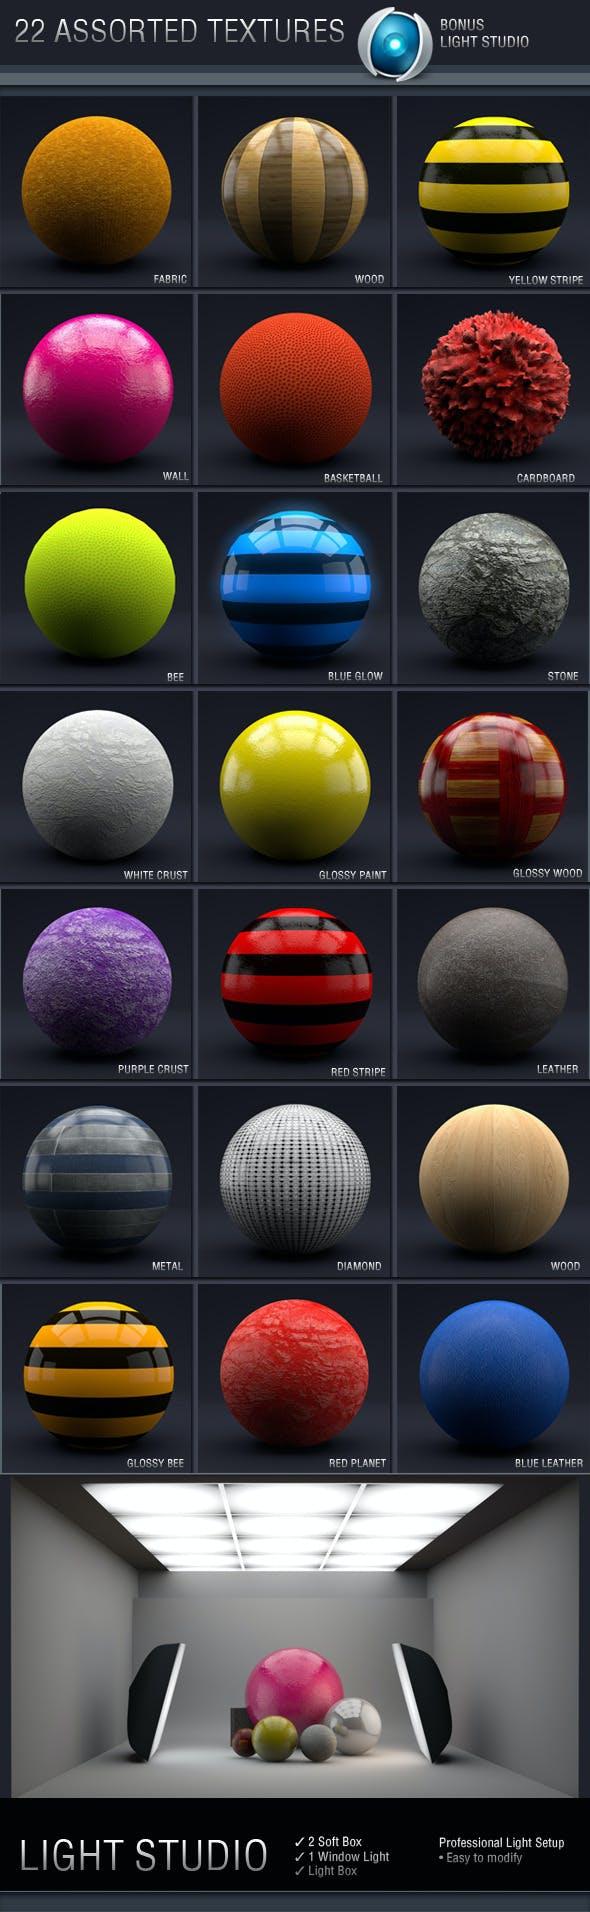 C4D Assorted Textures - 3DOcean Item for Sale